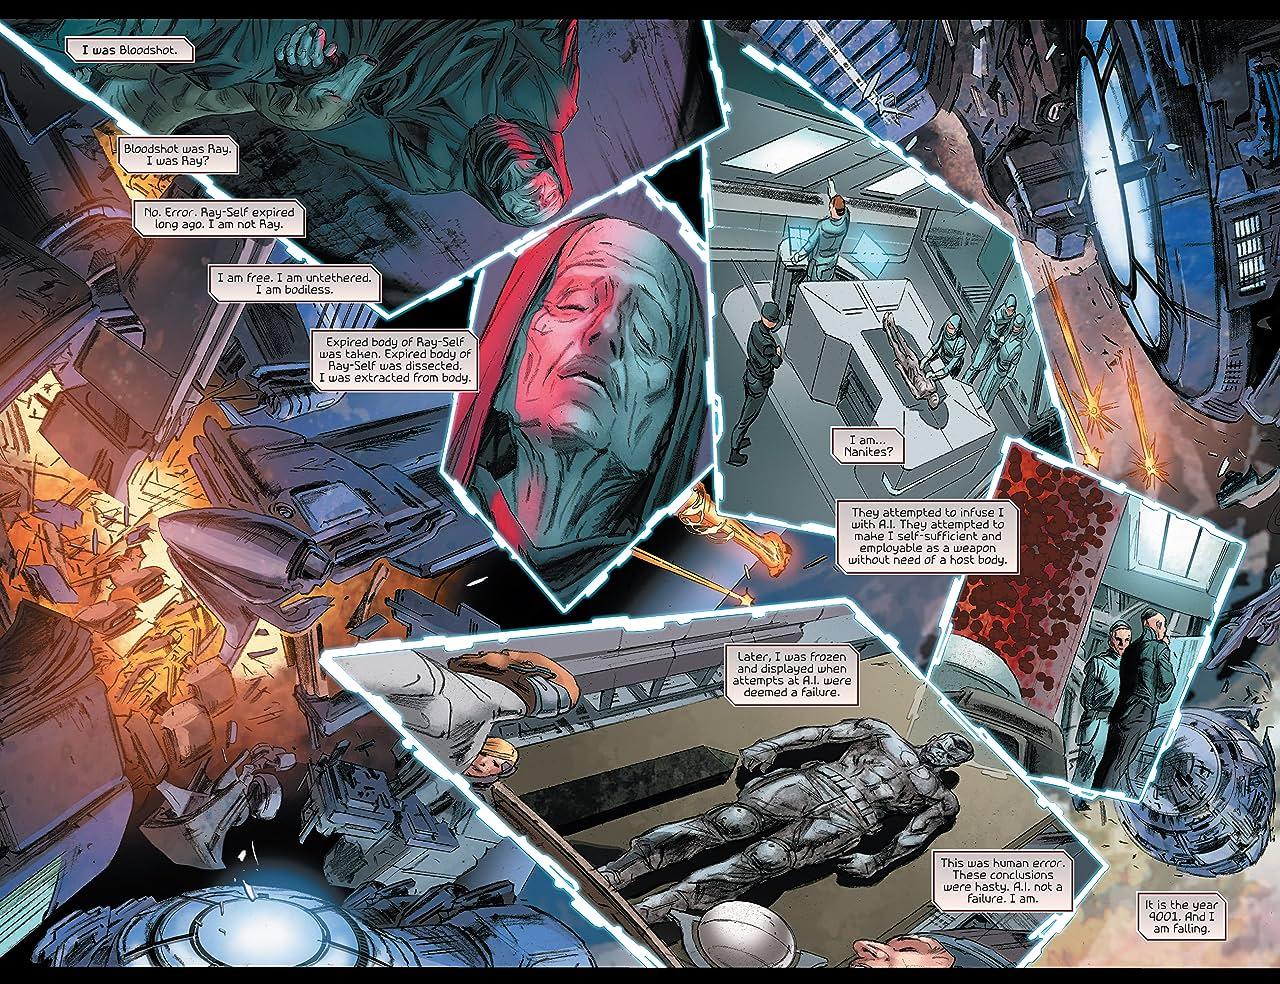 4001 A.D.: Bloodshot #1: Digital Exclusives Edition